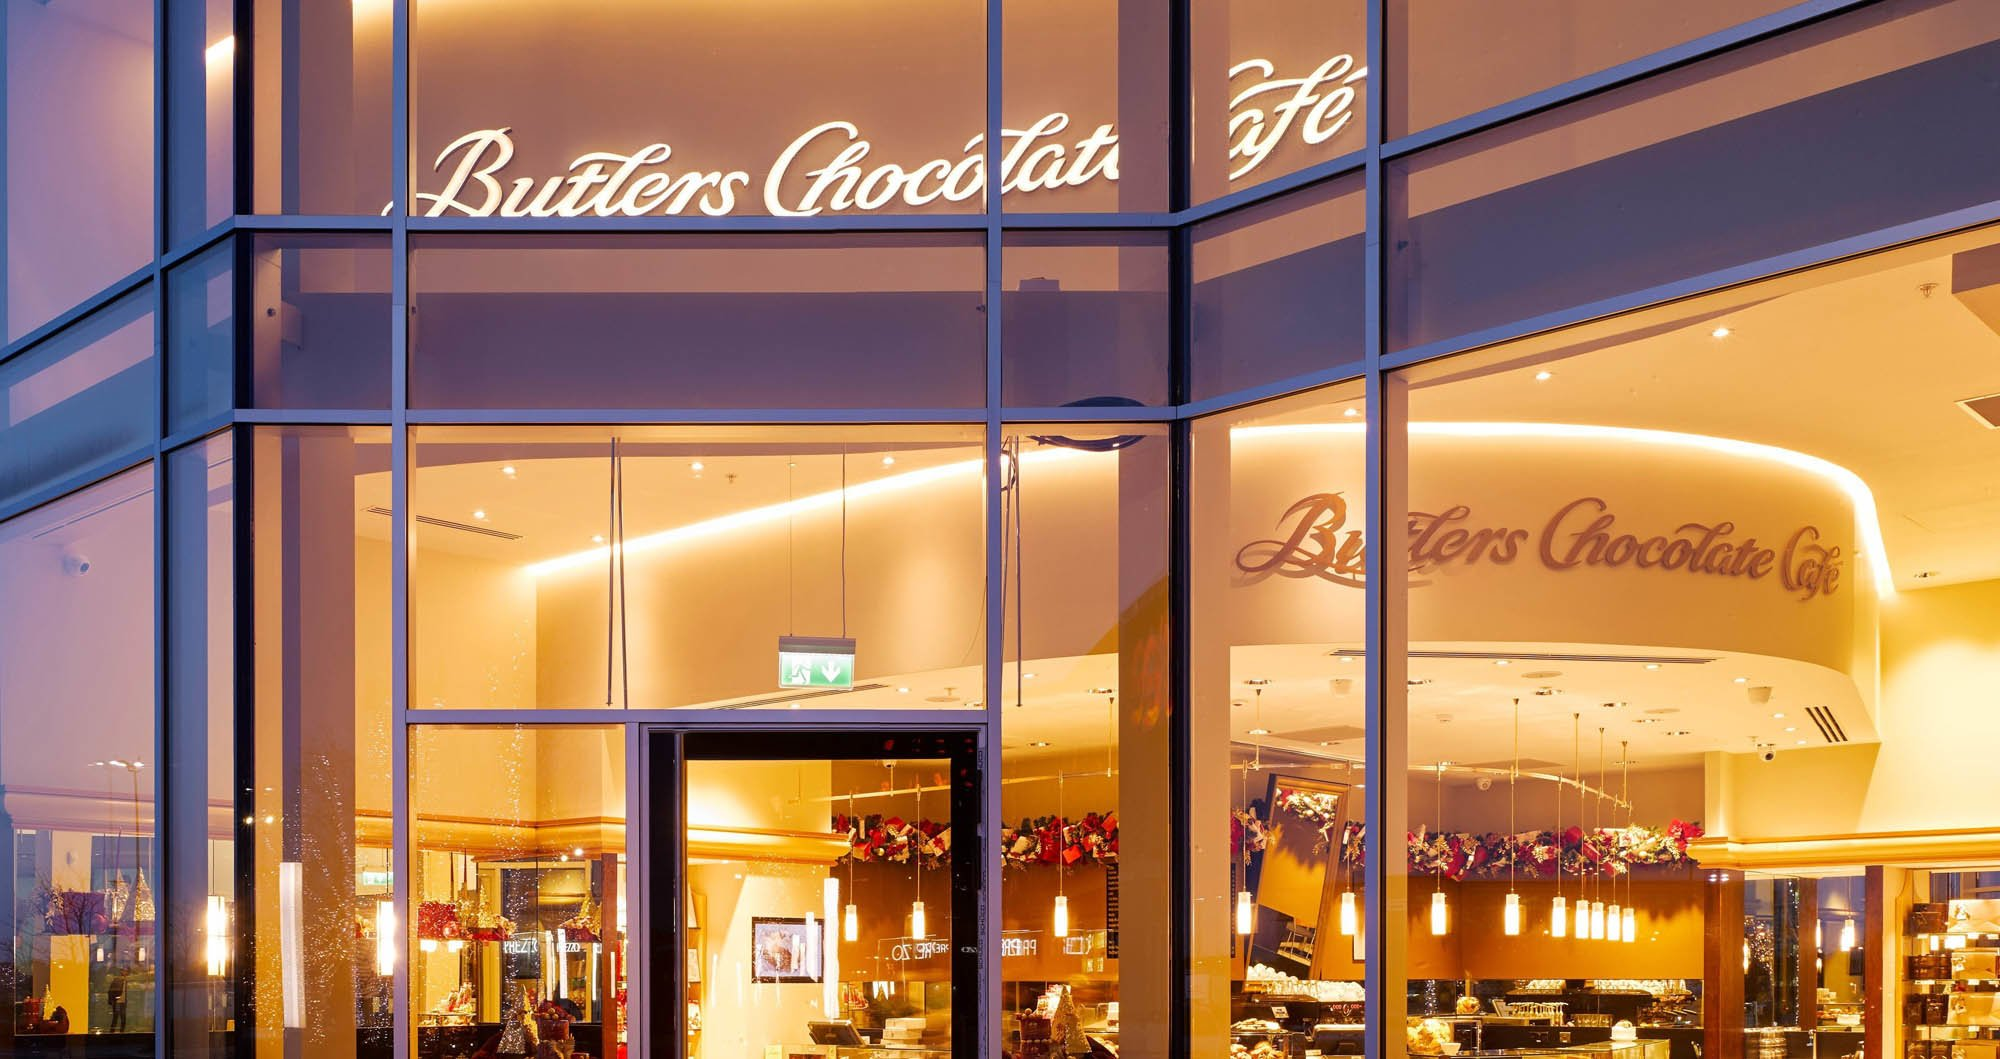 Butlers Chocolate Café, Liffey Valley